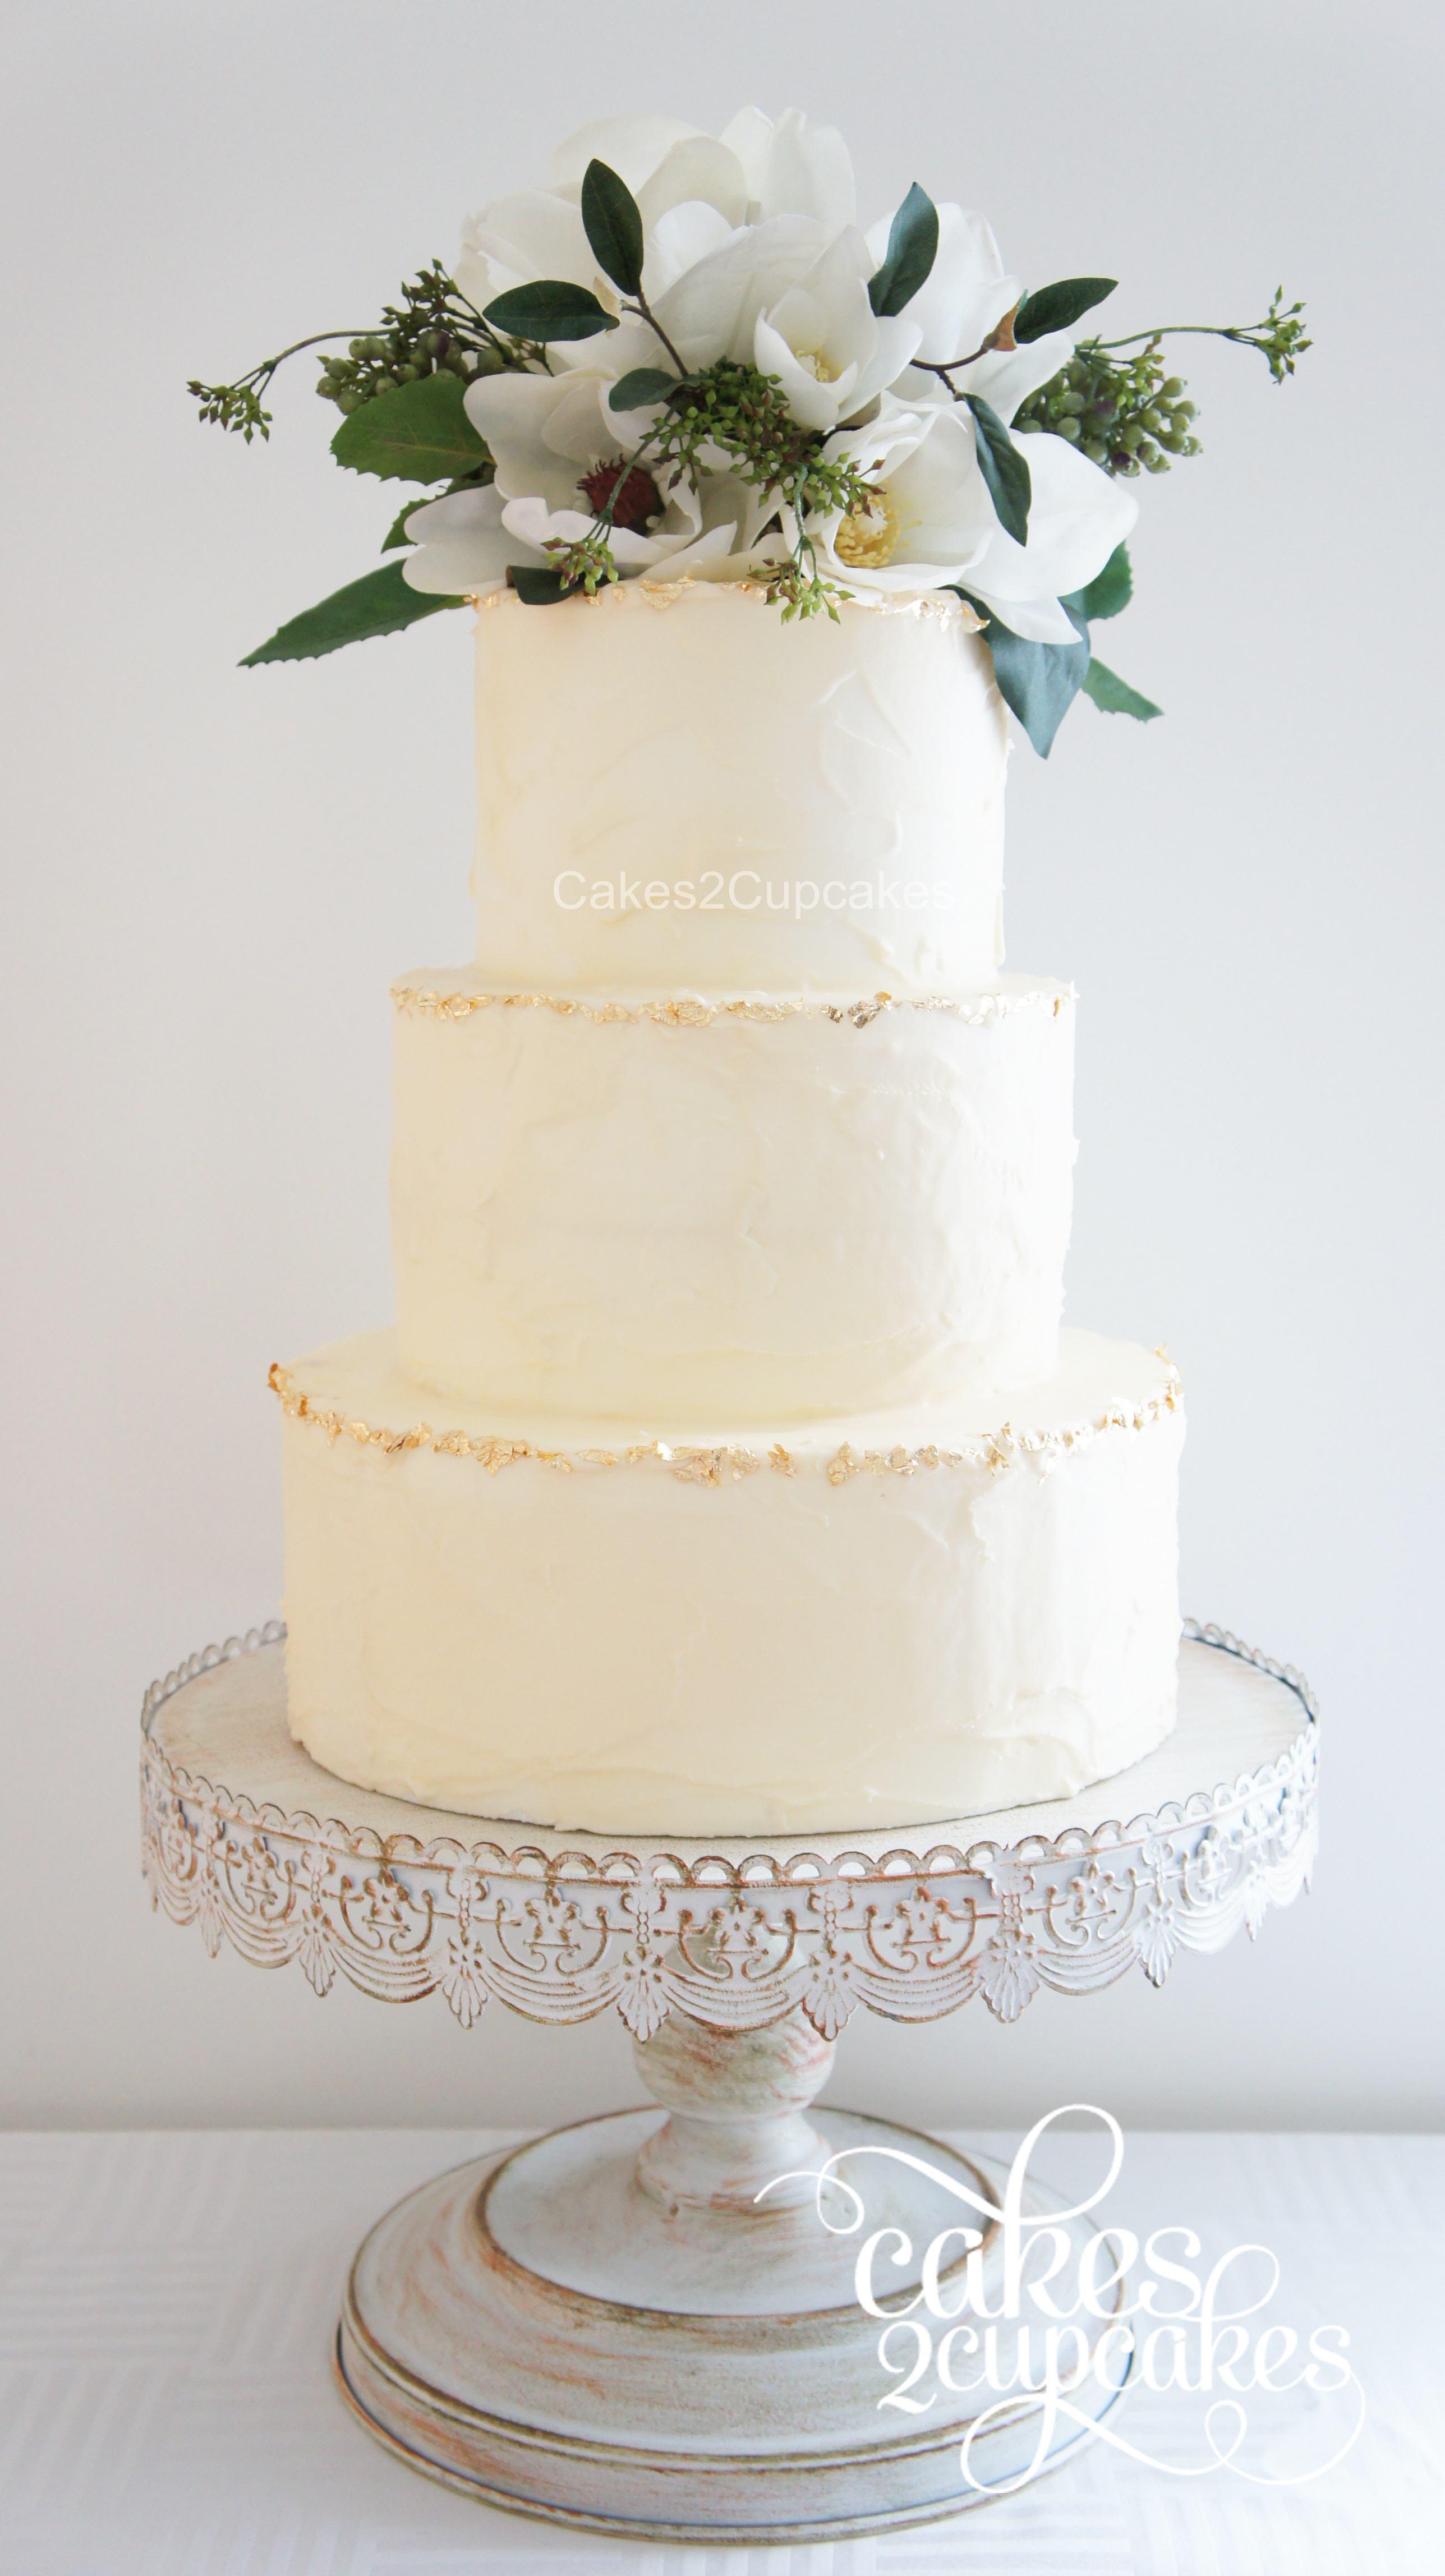 cakes2cupcakes-buttercream-gold.jpg